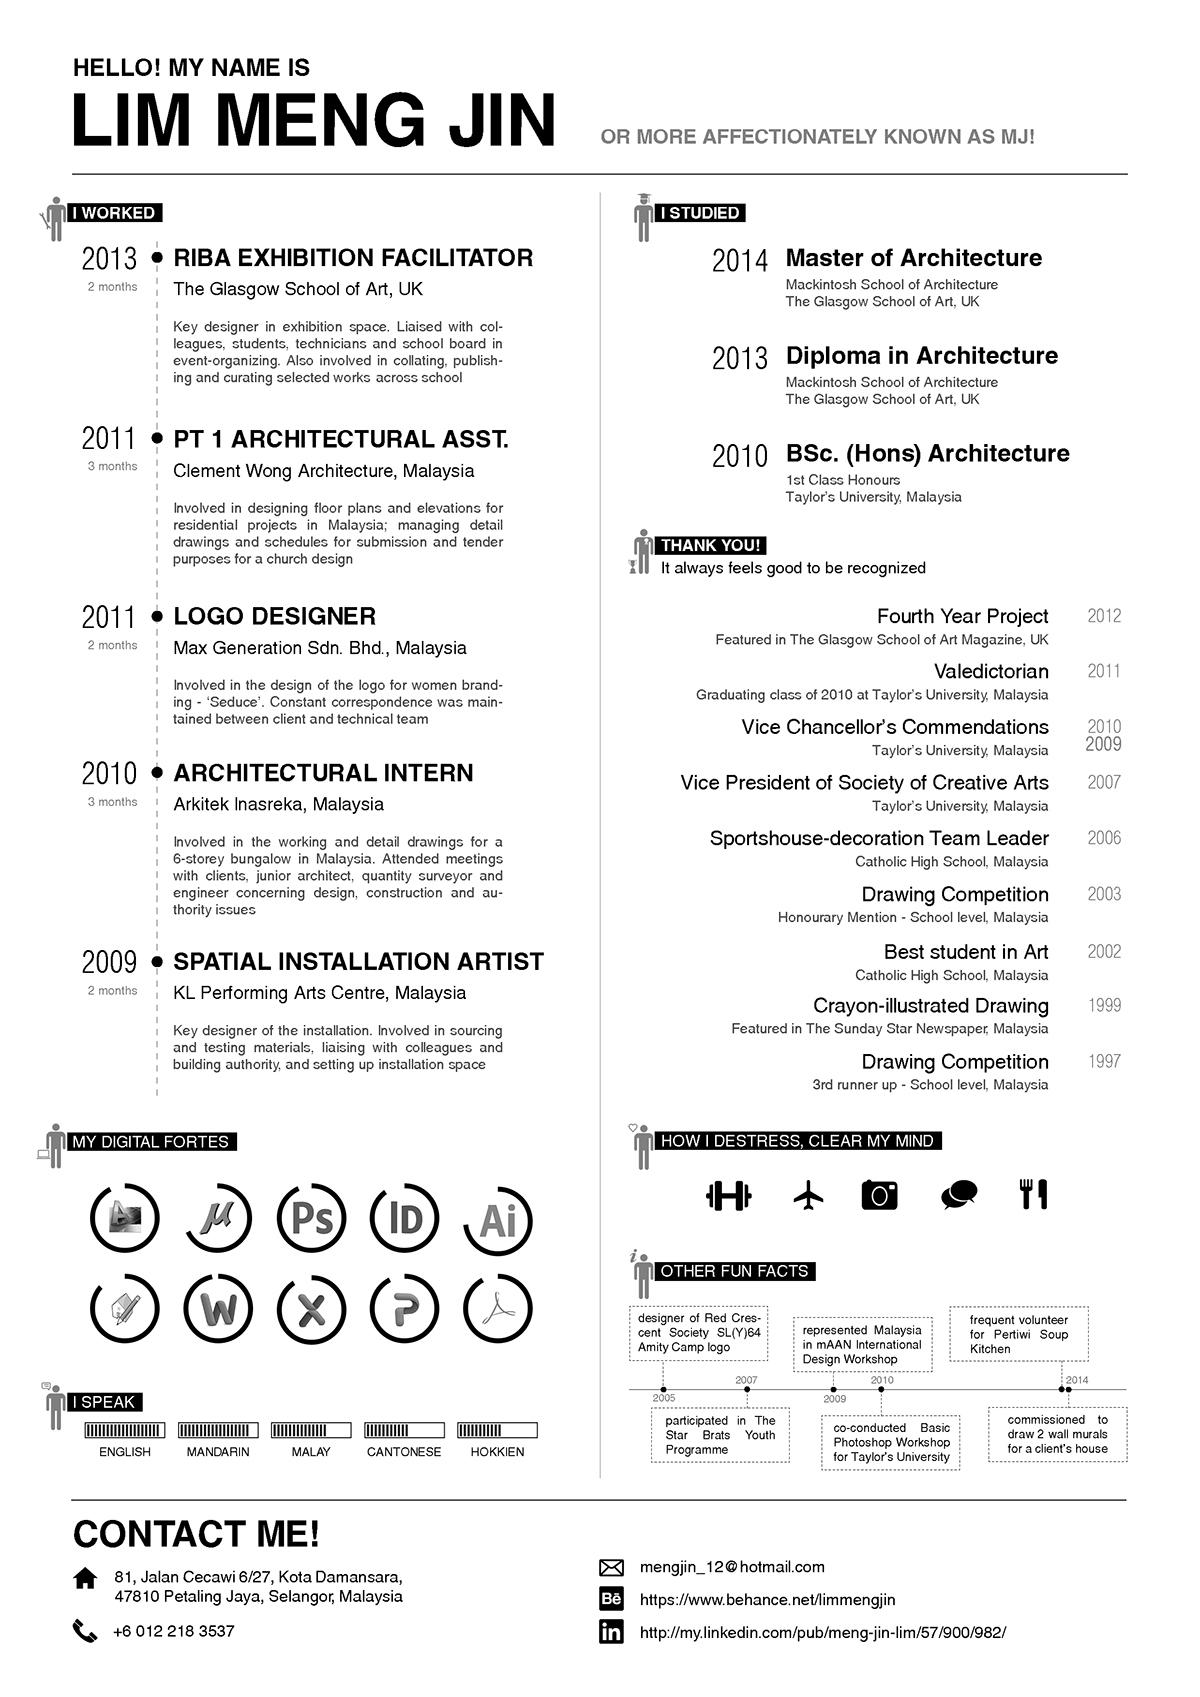 Curriculum Vitae 2014 on Behance